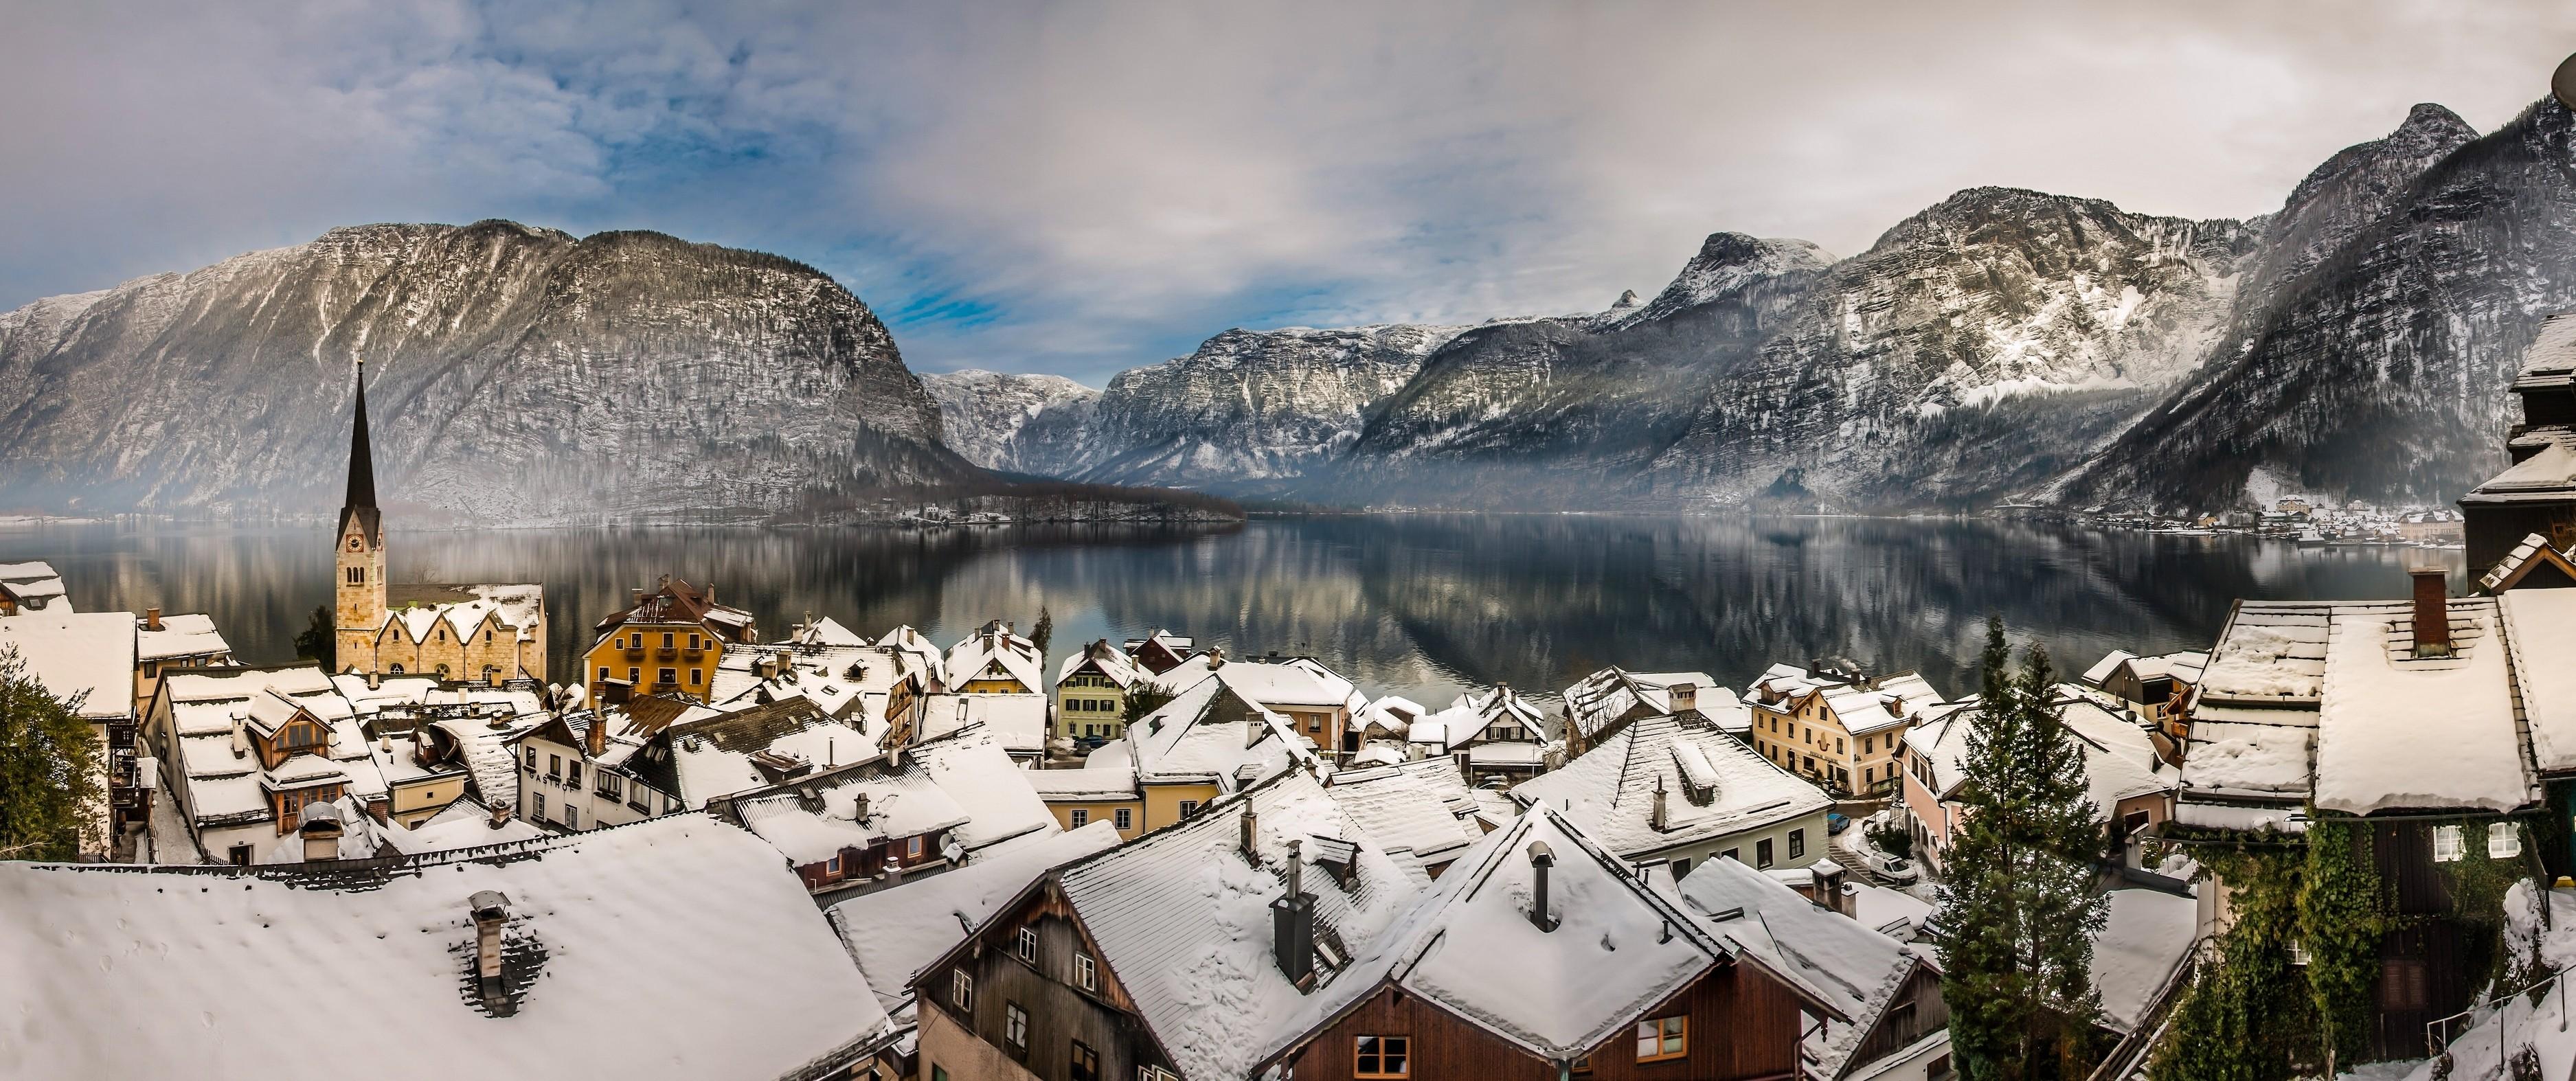 General 3750x1574 Hallstatt Austria village rooftops mountains lake cityscape landscape